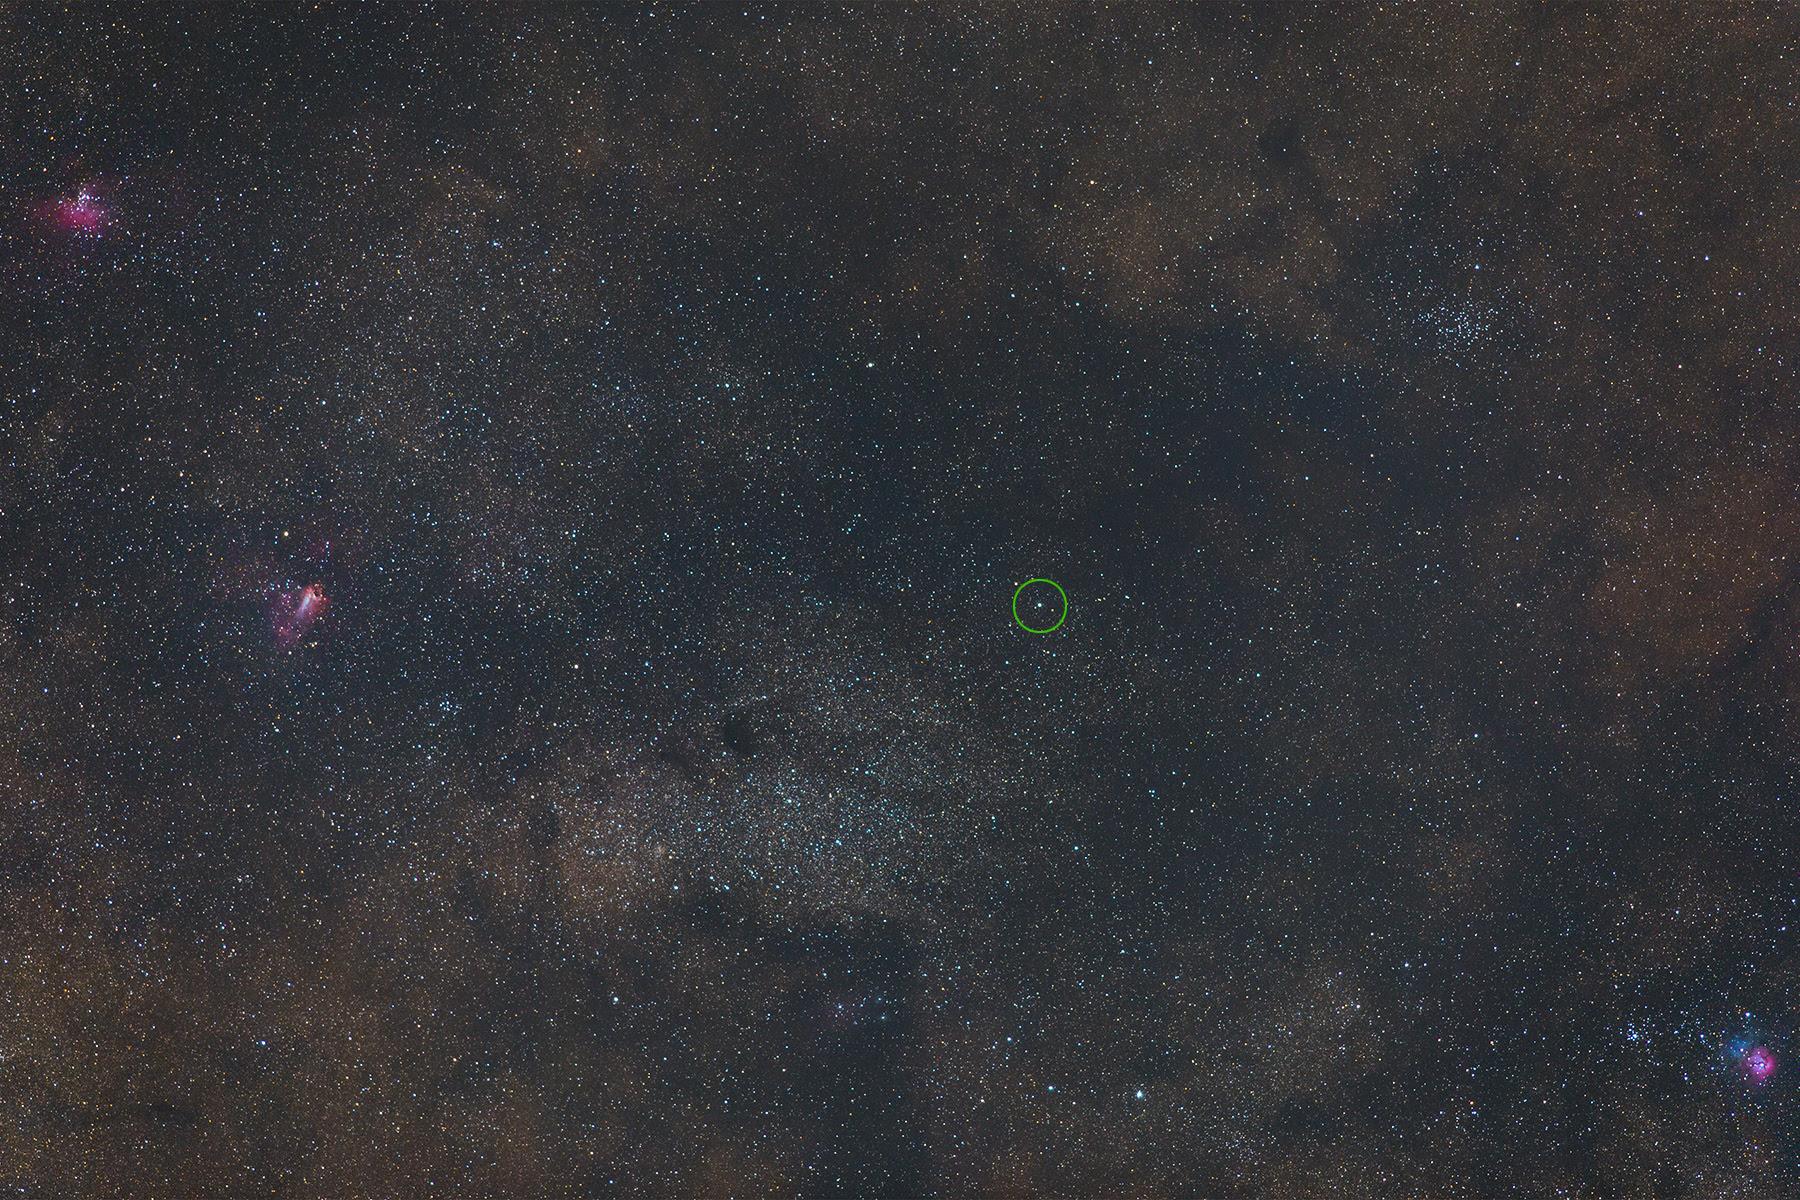 Widefield view of asteroid 4 Vesta on June 2, 2018